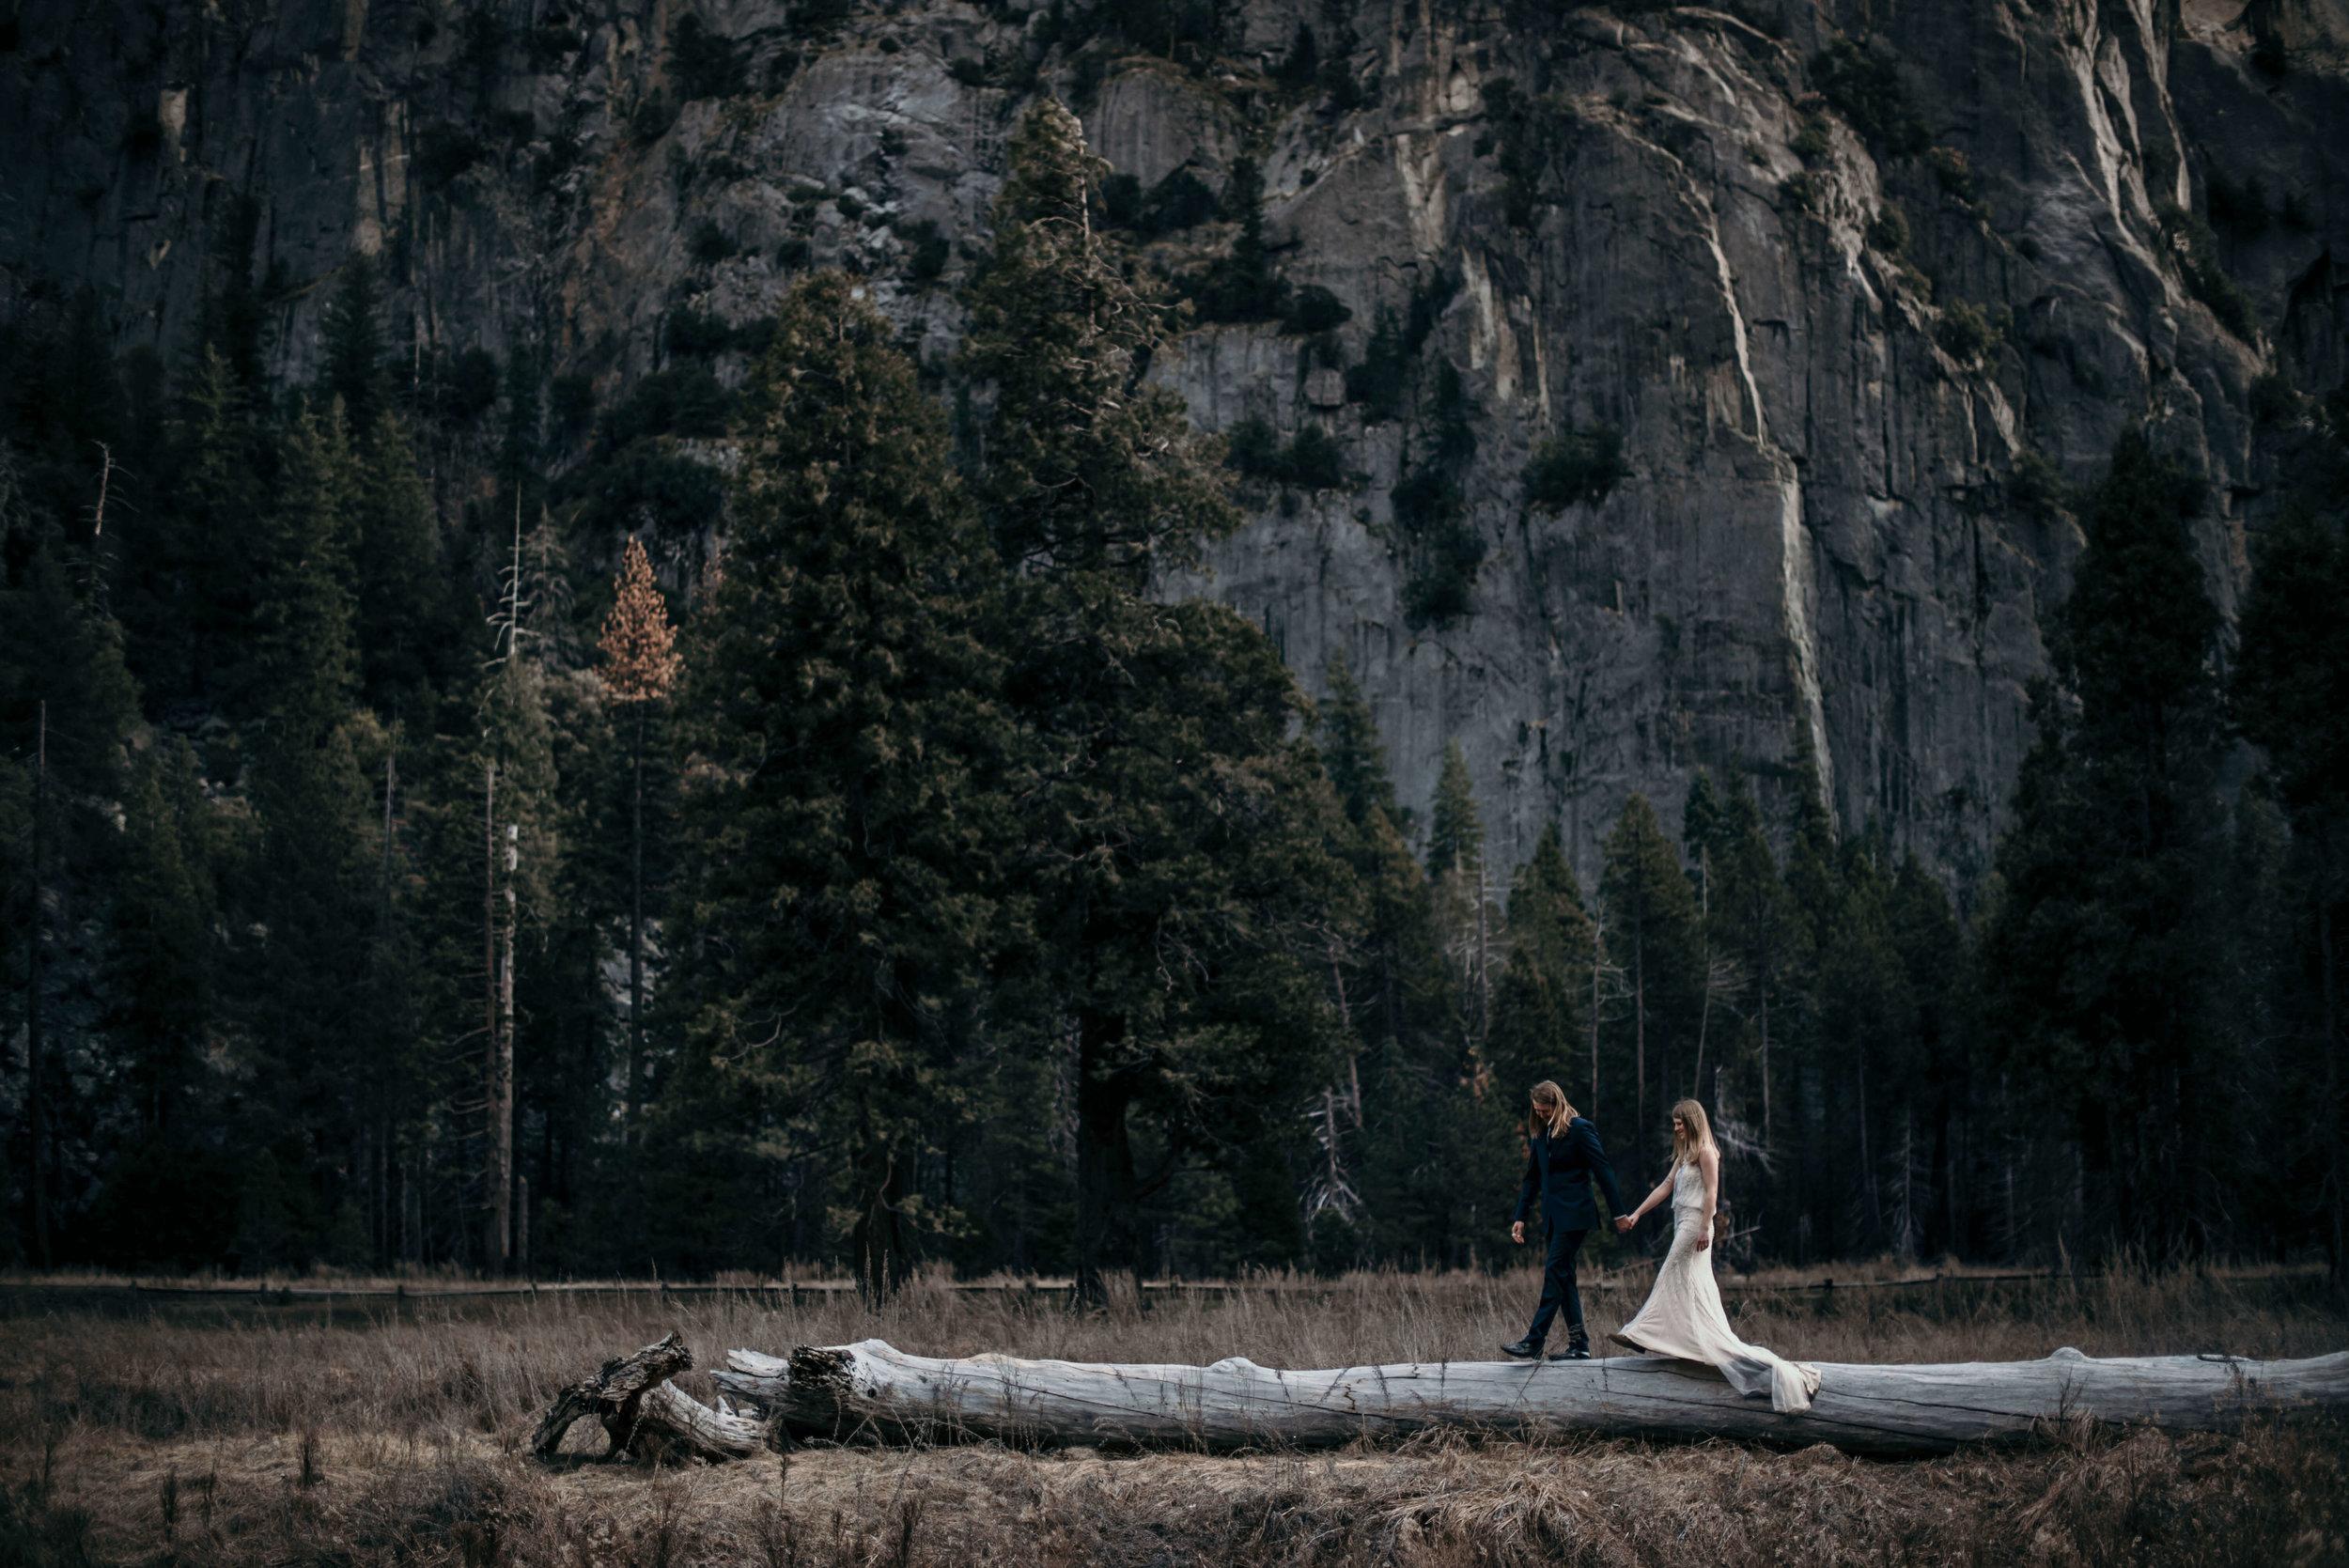 Adventure-Elopement-Yosemite-Valley-12.jpg